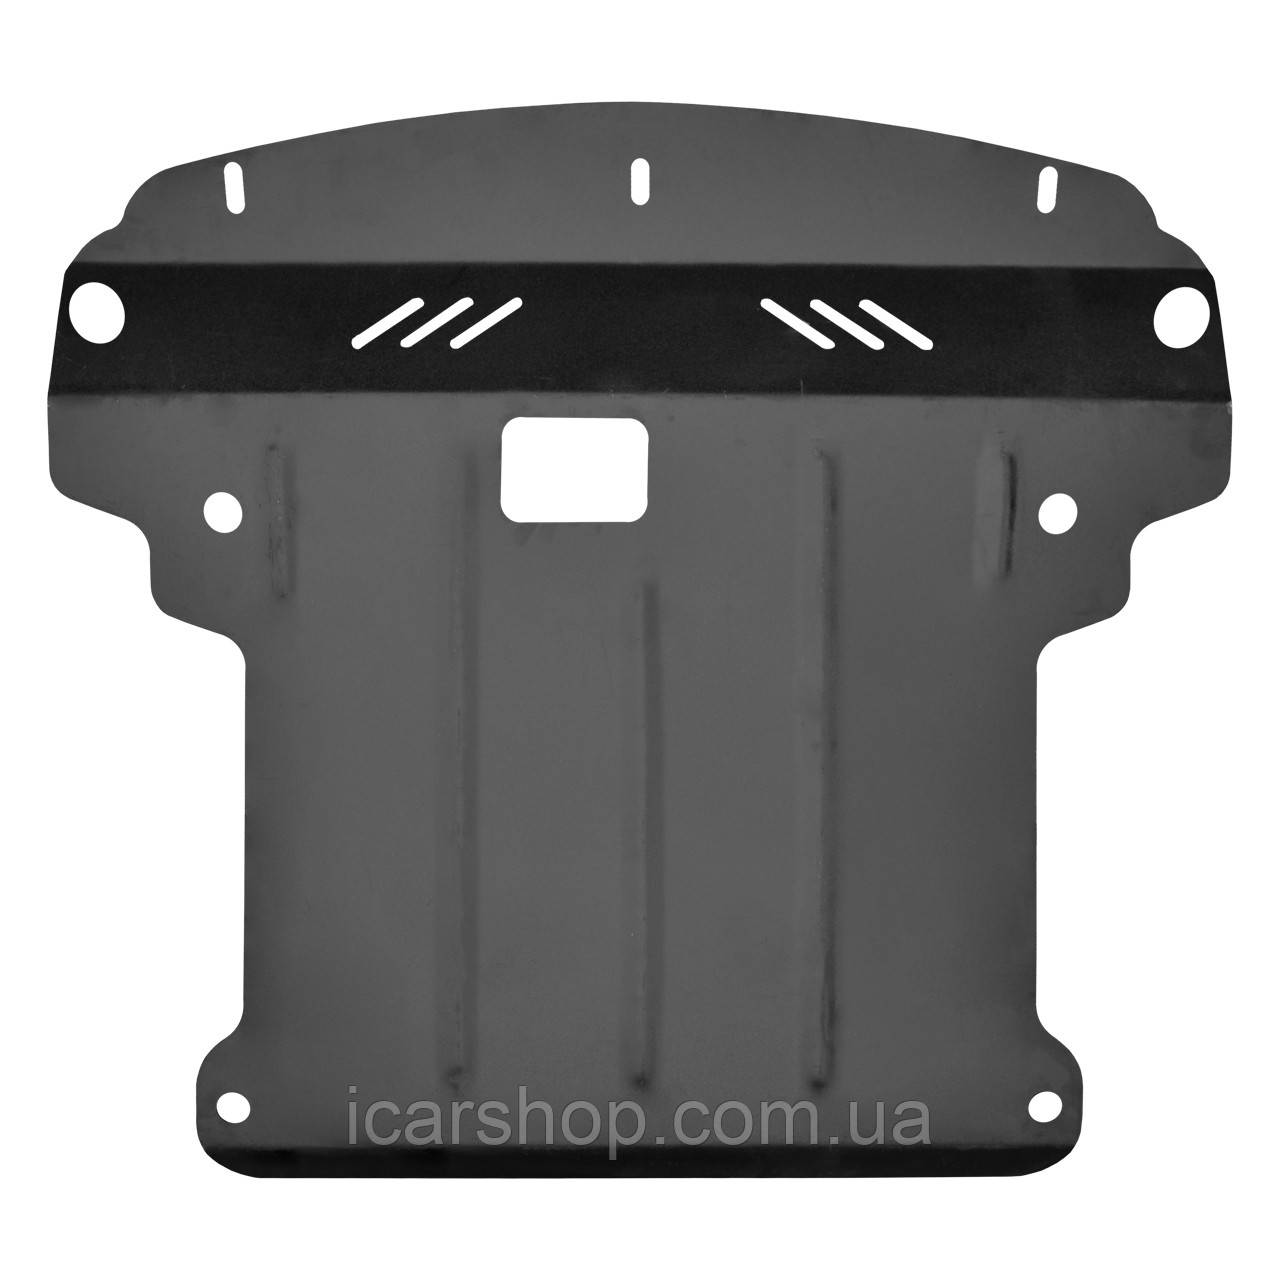 Захист Двигуна / КПП VW. Crafter 06 - Titan